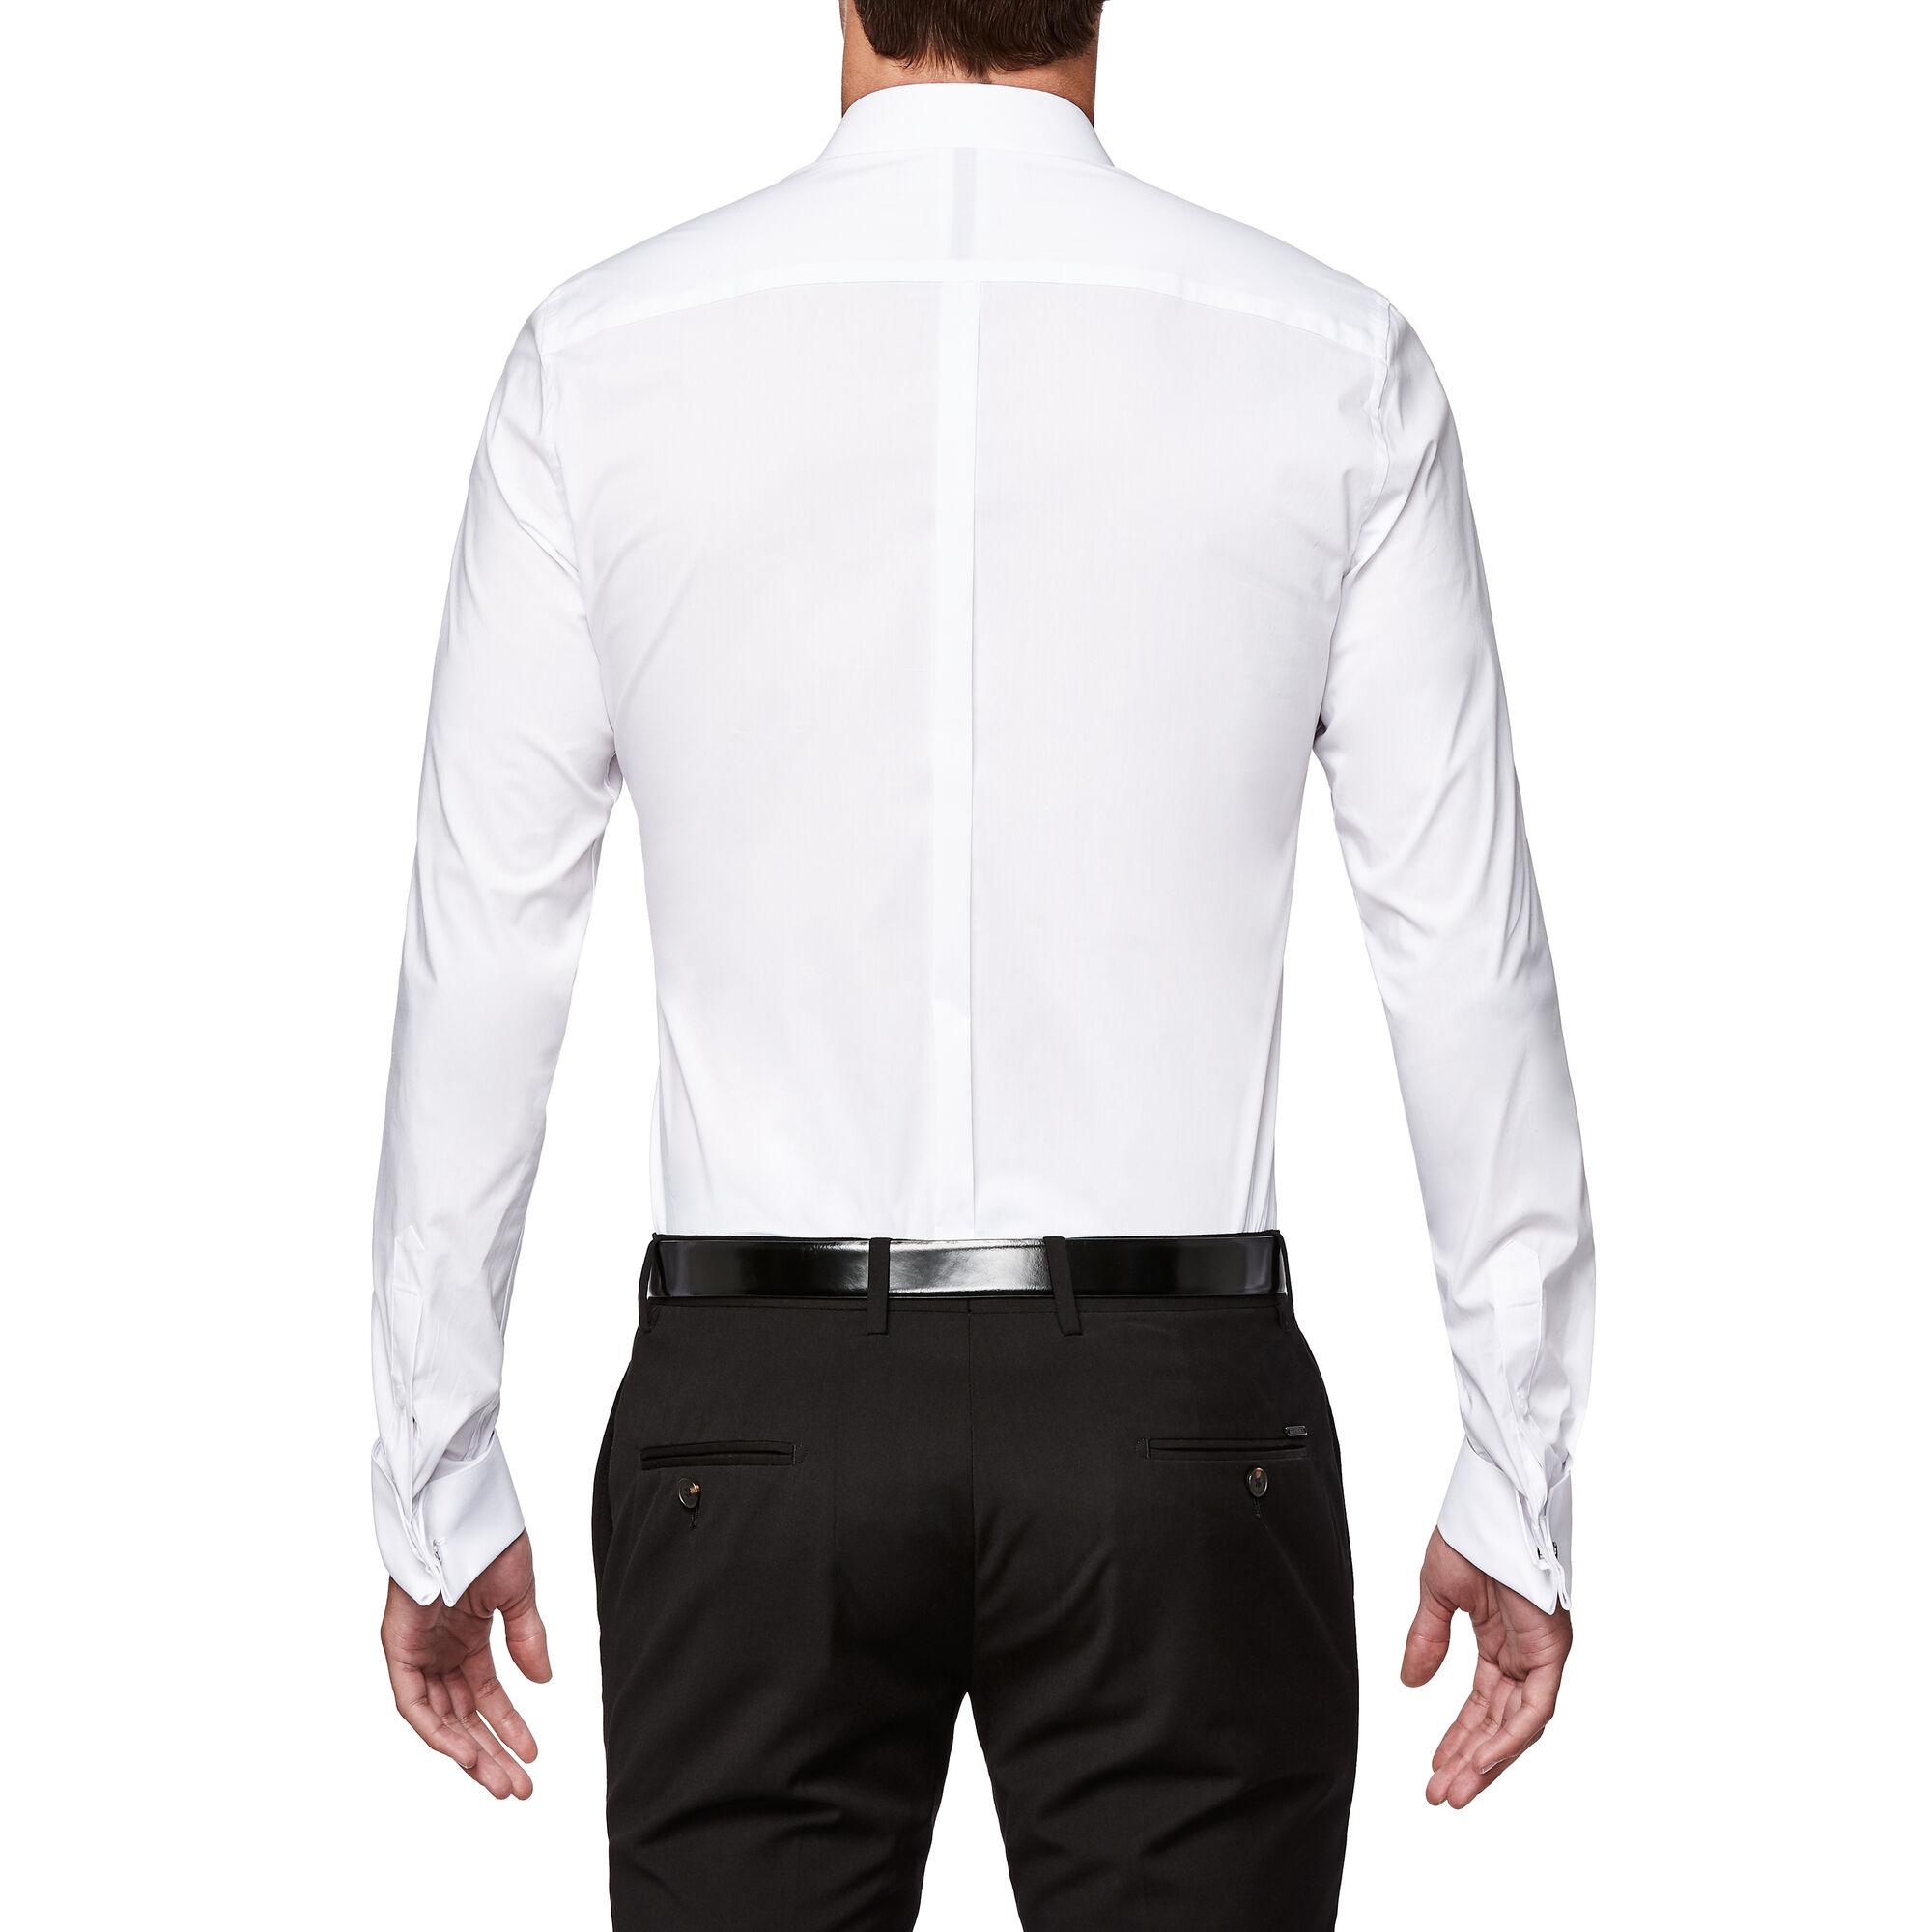 8b3520c3e1f Hammond - White - L S French Cuff Formal Shirt